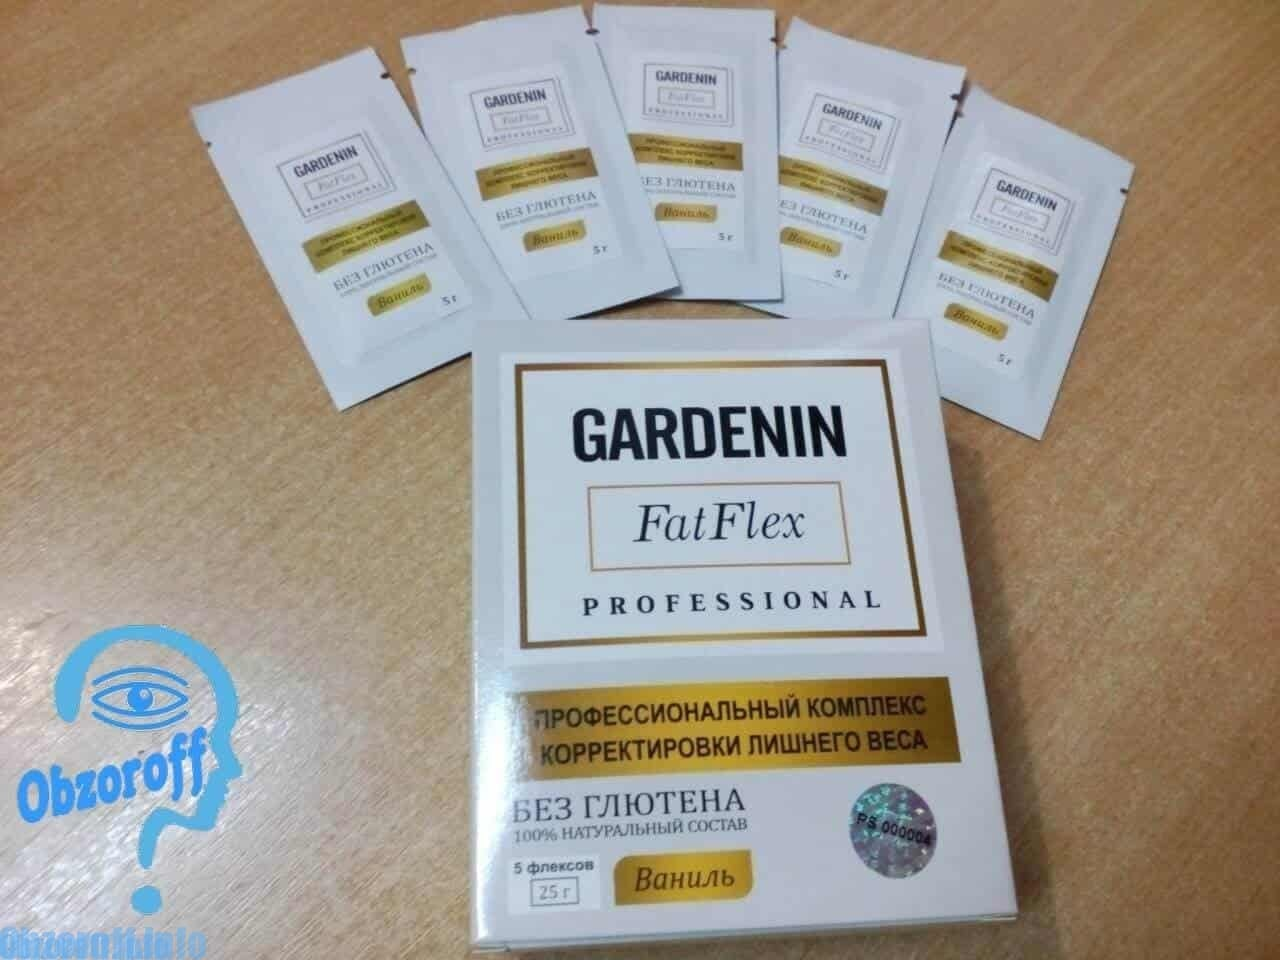 Gardenin fatflex packaging